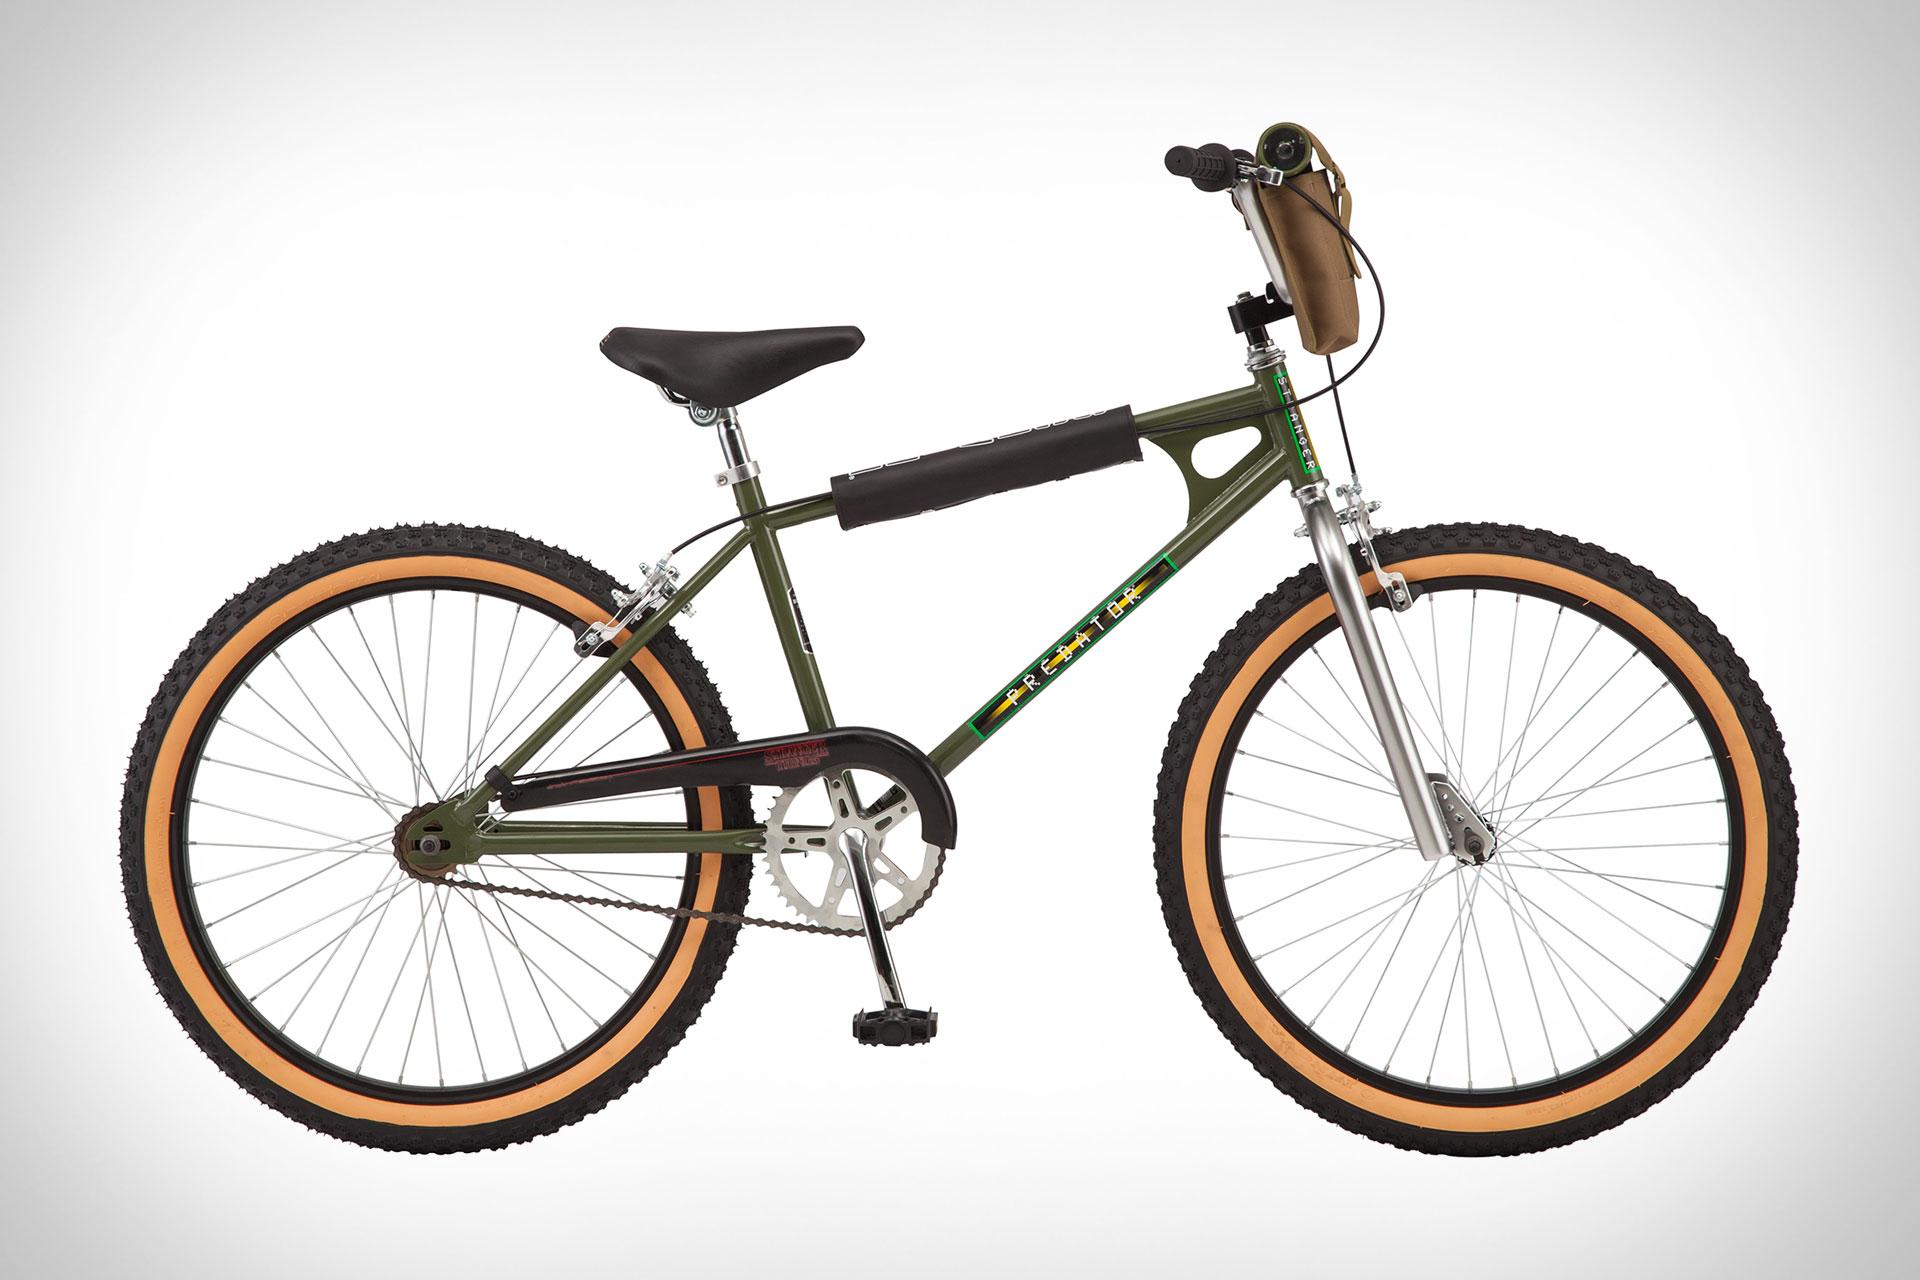 Schwinn x Stranger Things Lucas Sinclair Bicycle